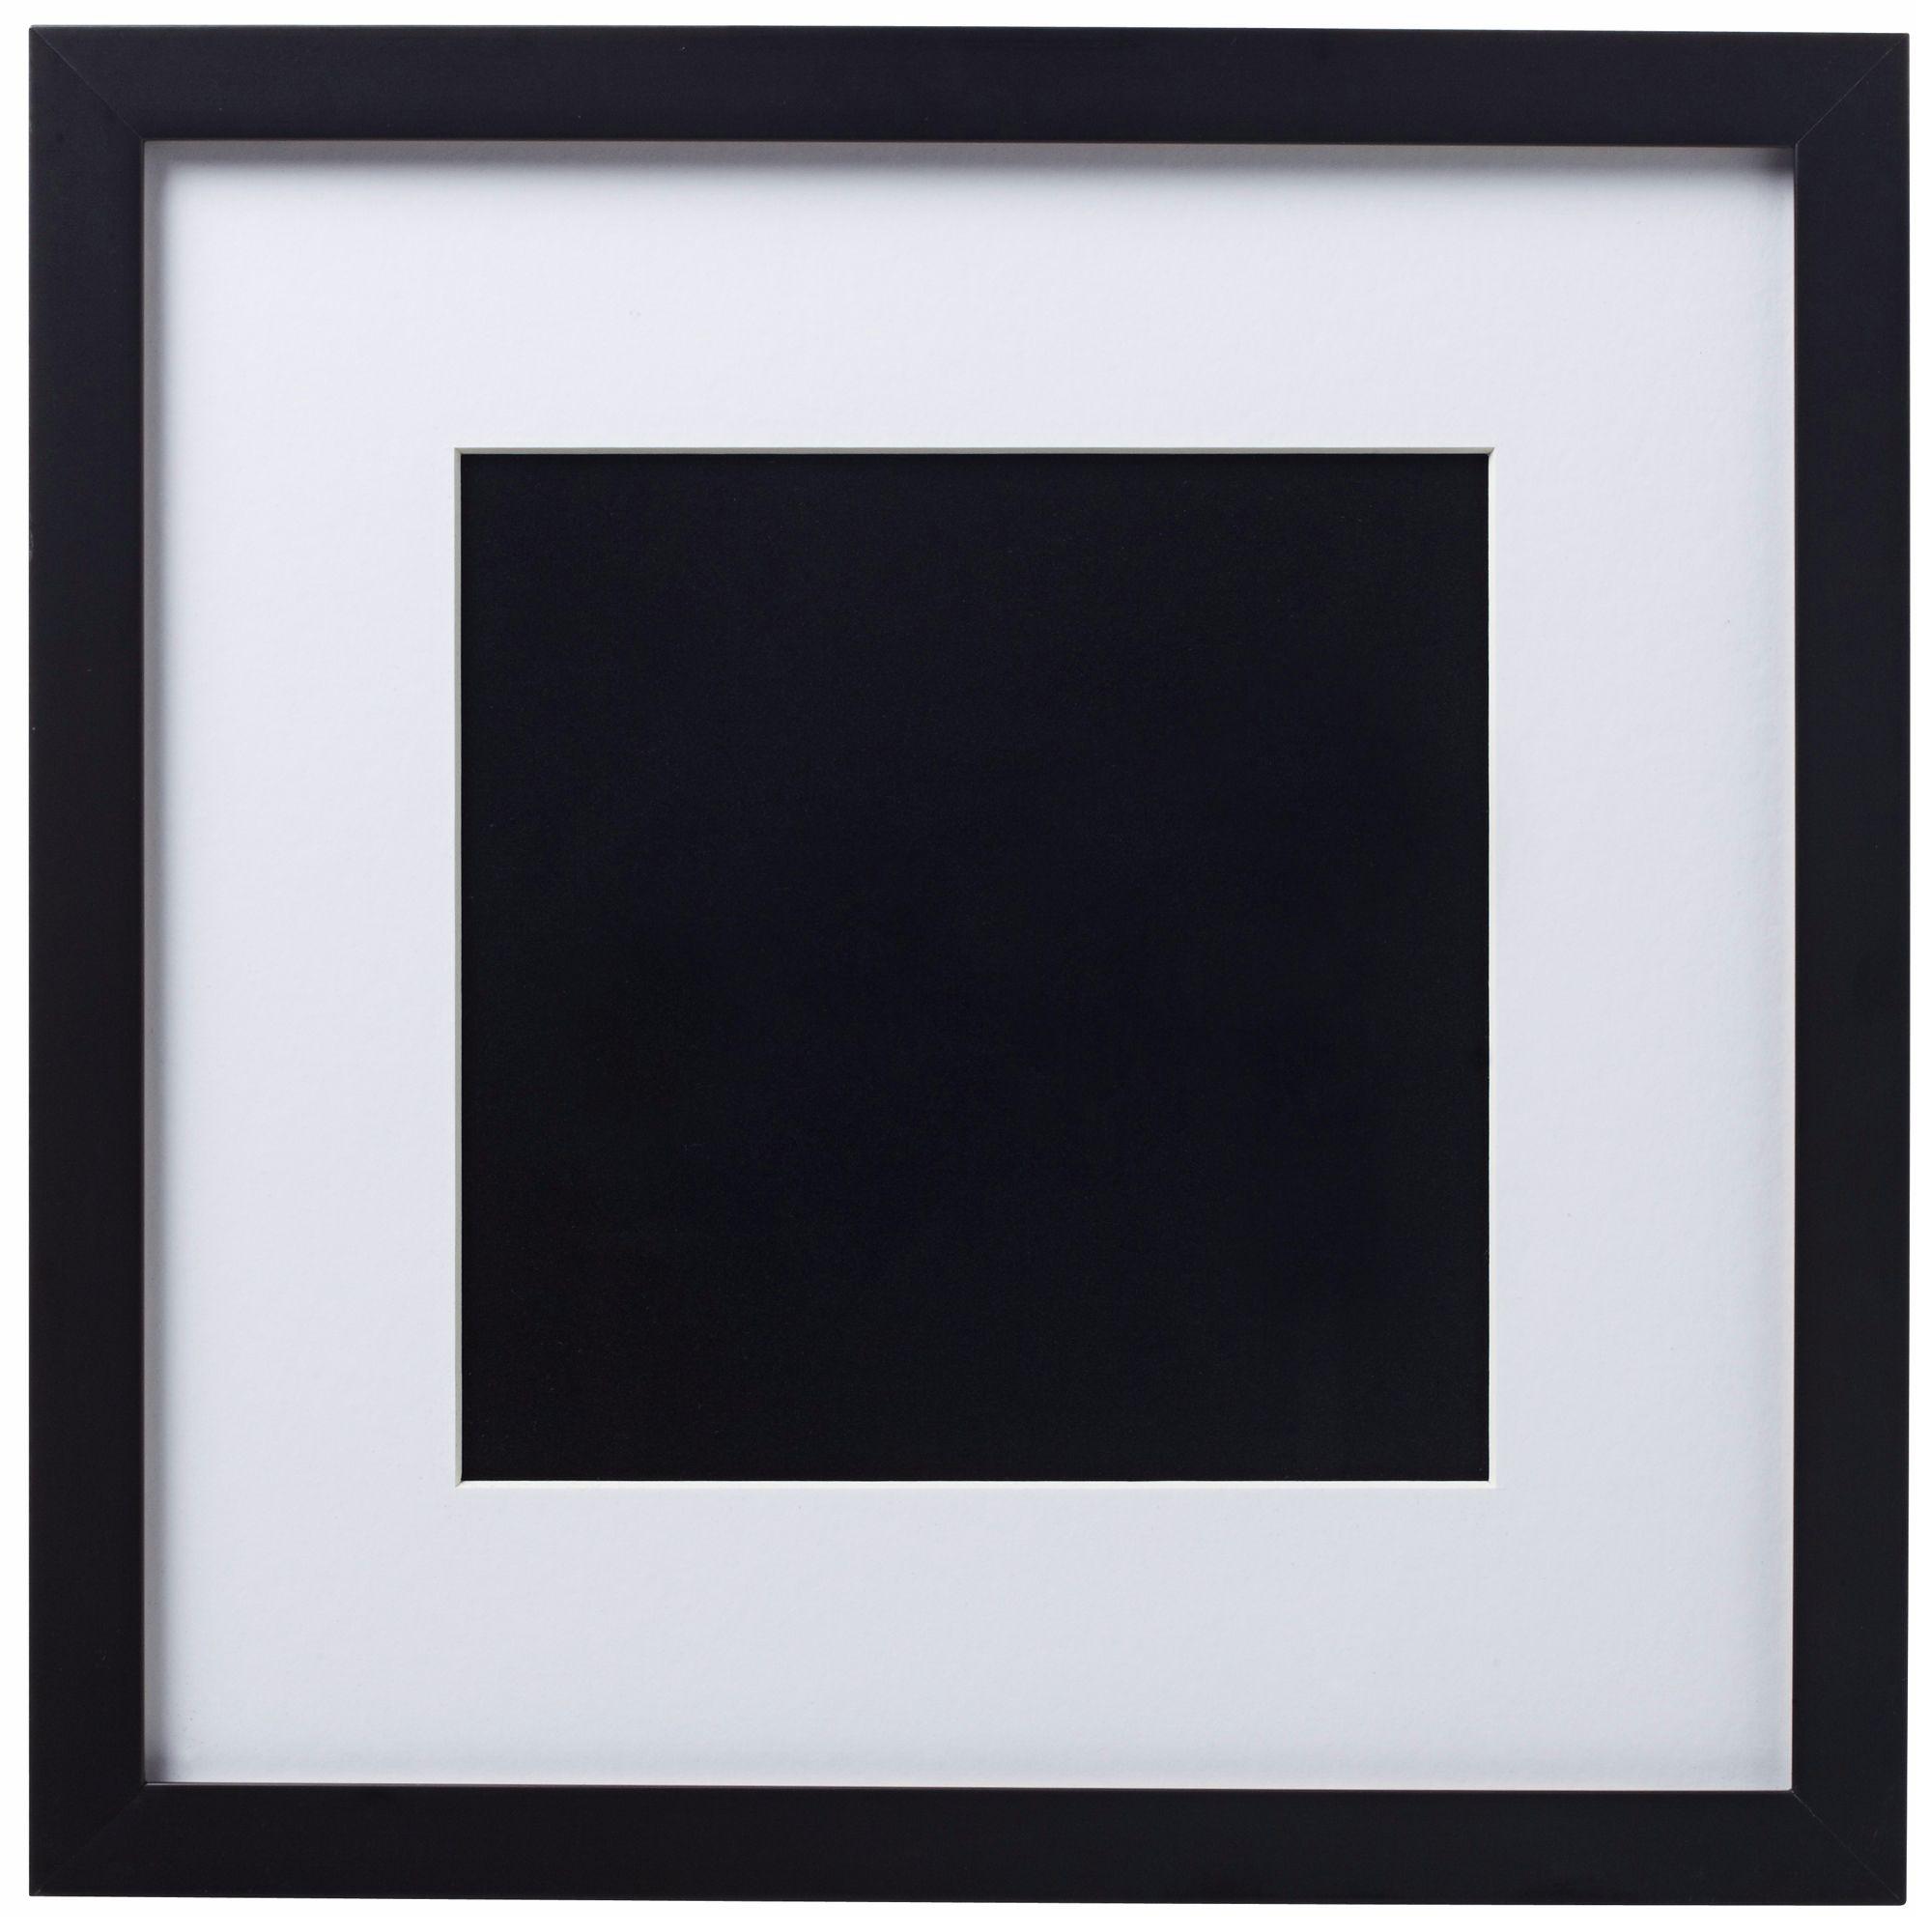 14 x 14 black finish with white matting wall art frame